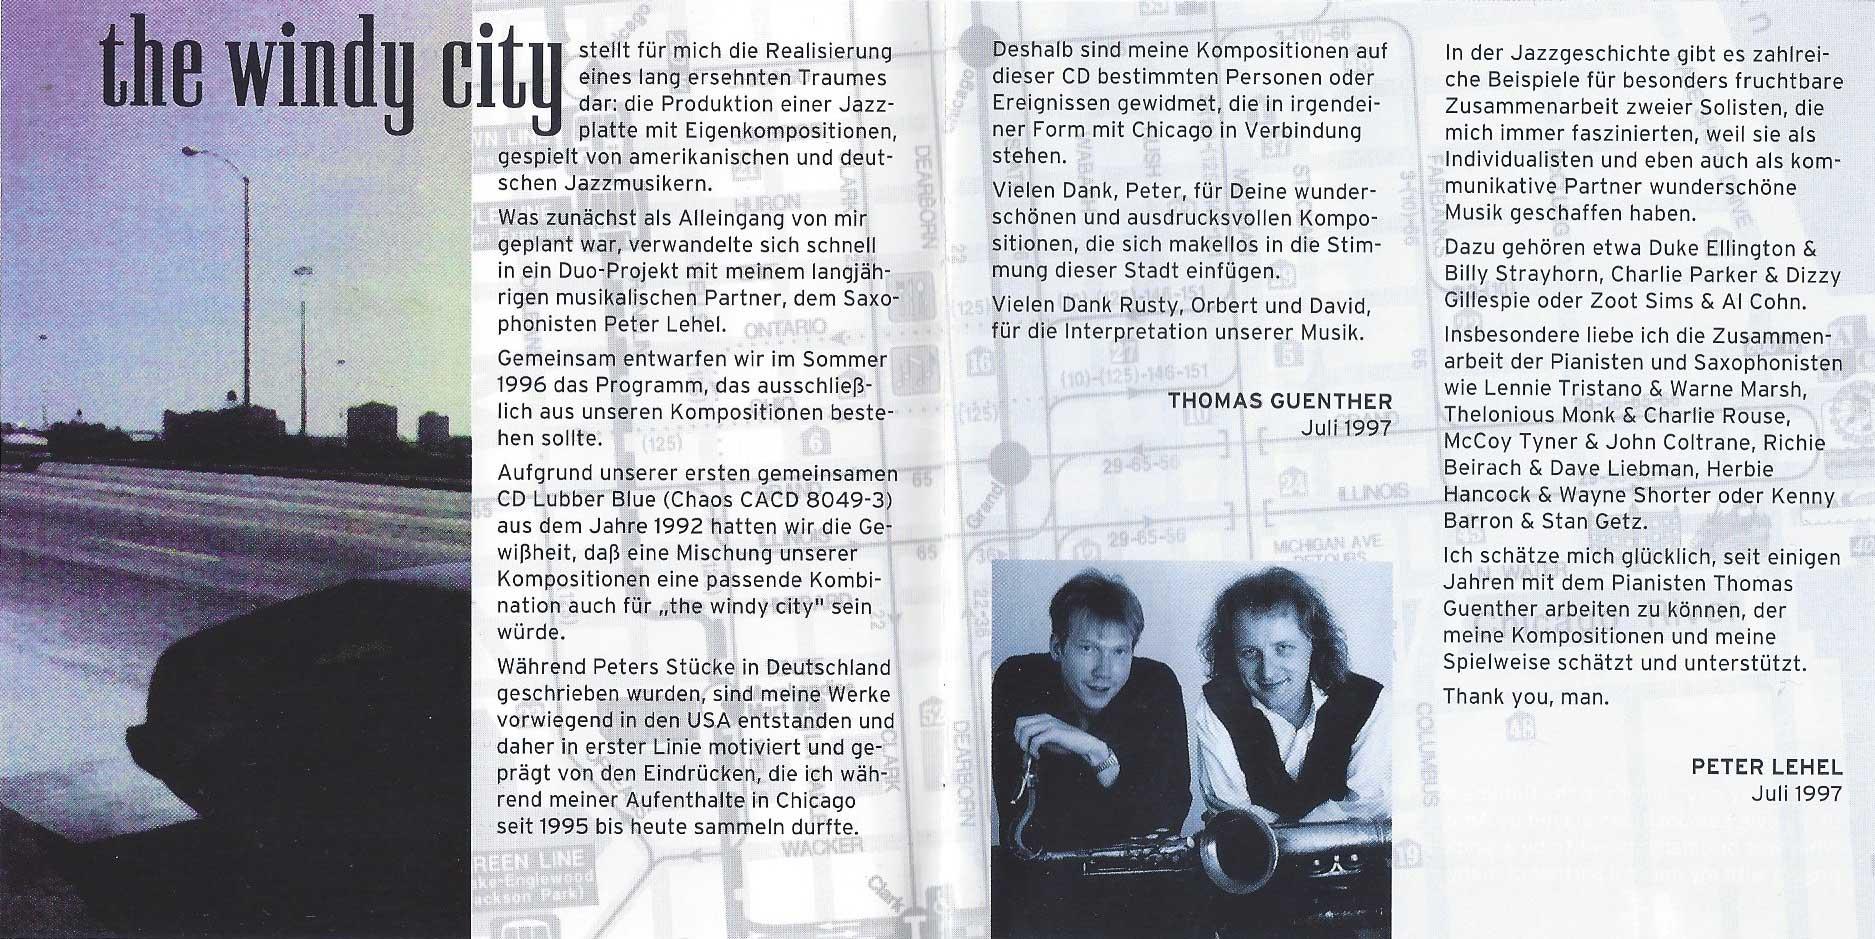 Windy-City-CD-Original-Booklet-p1-2